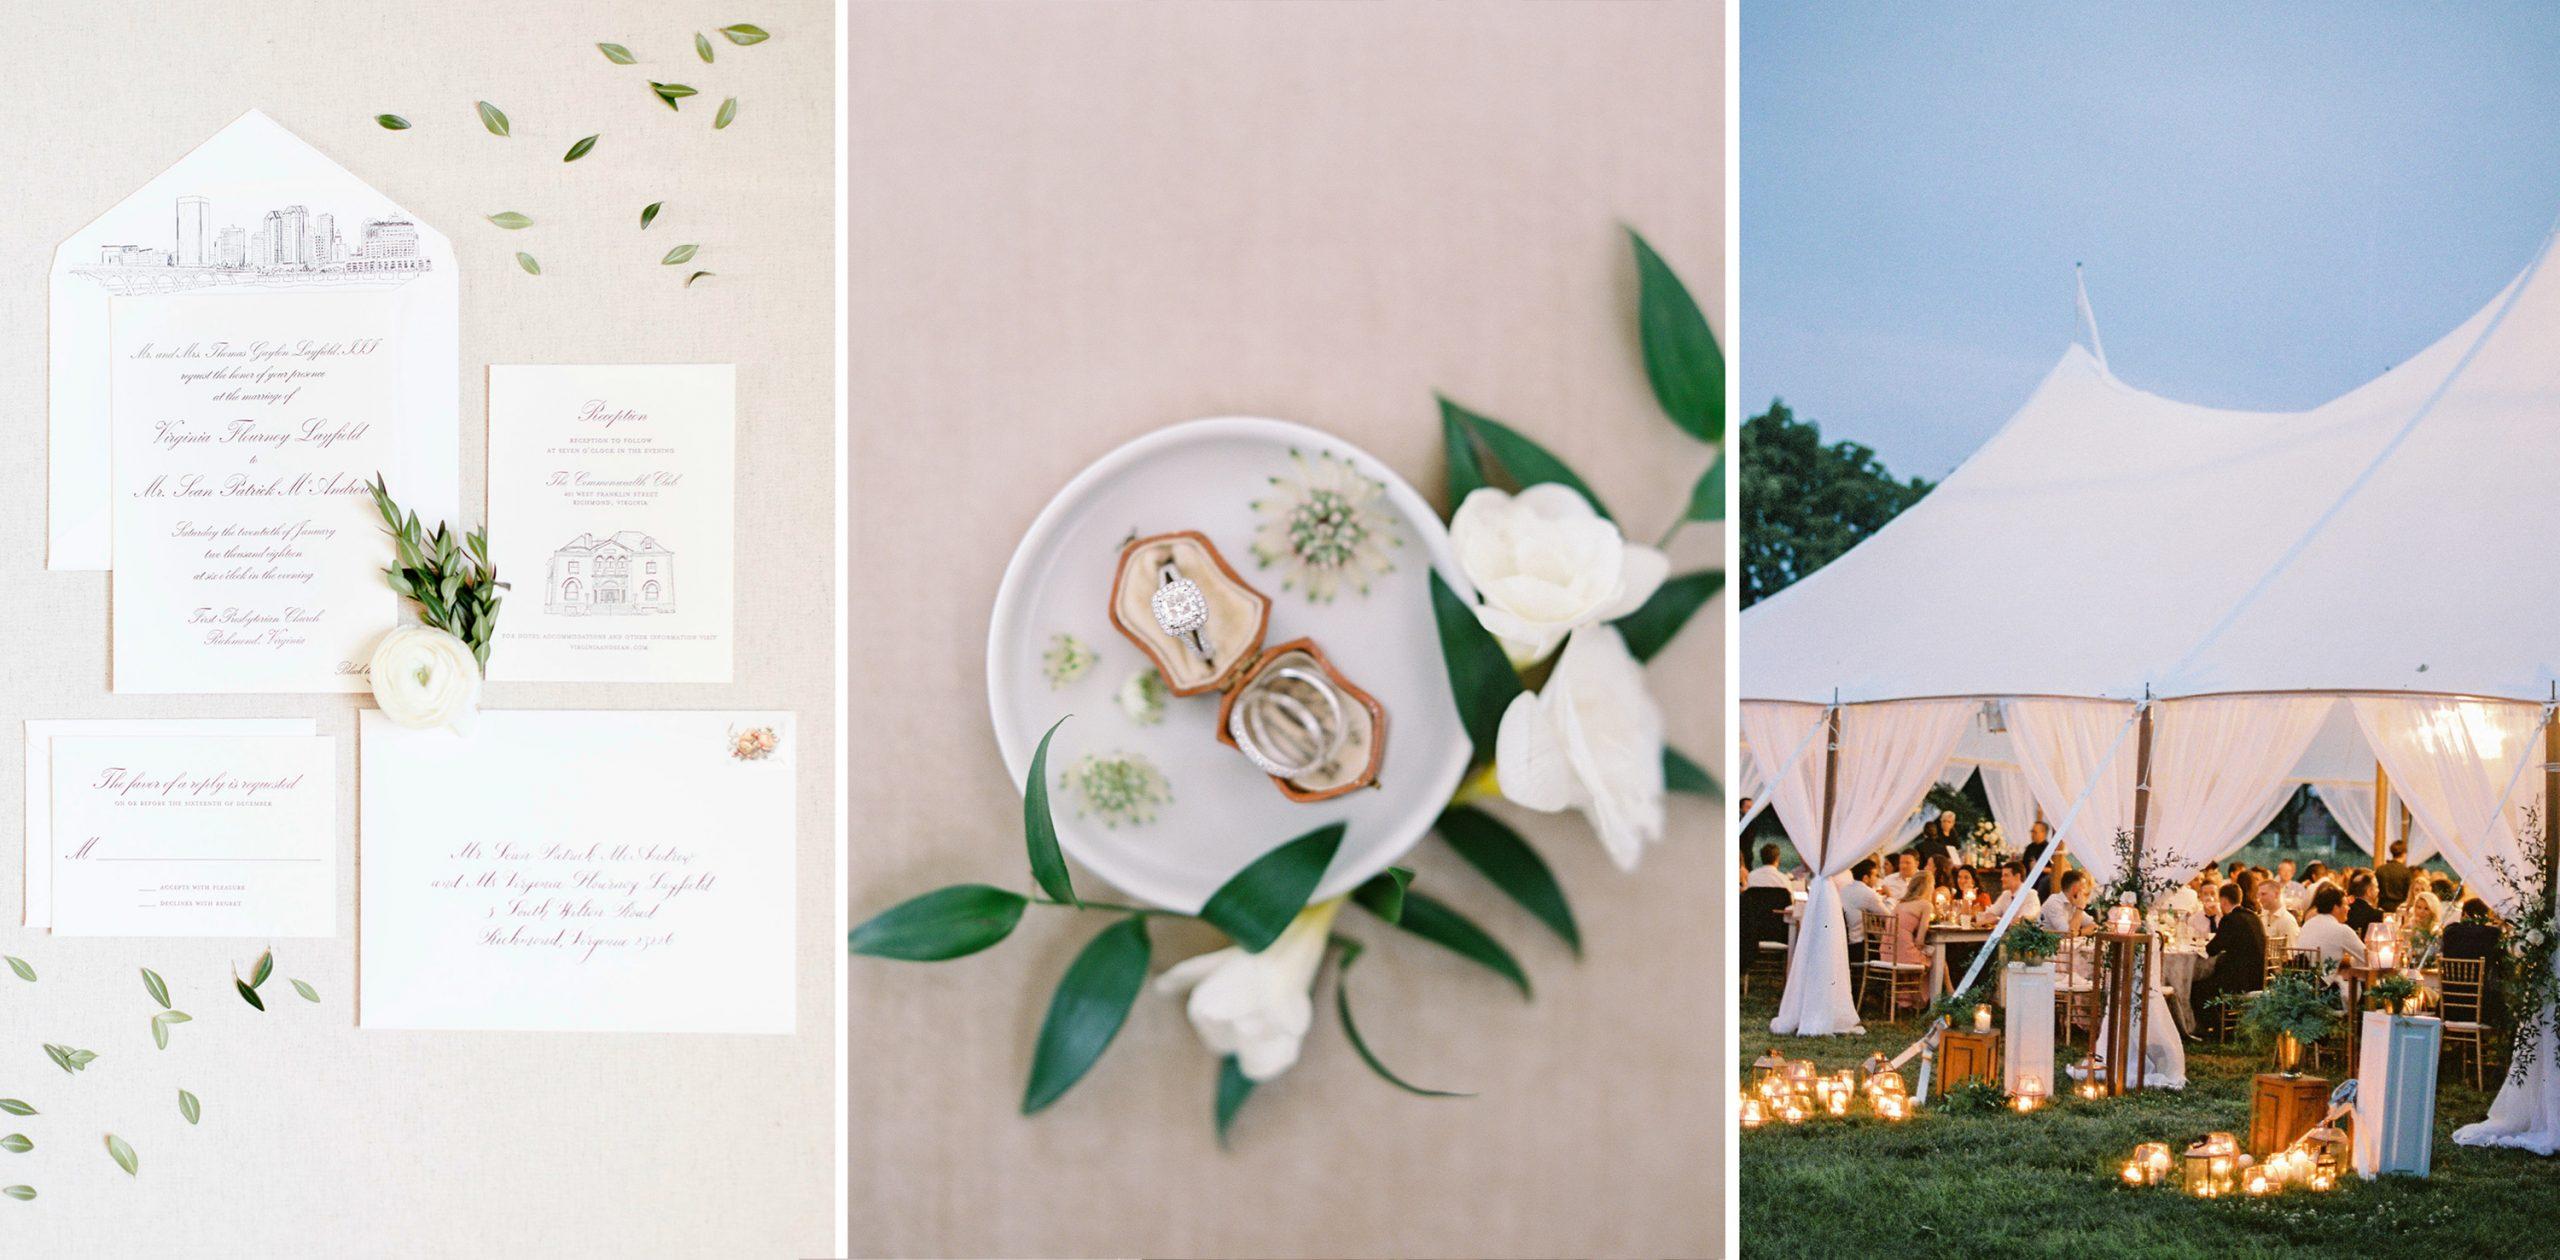 wedding planning services destination image 1